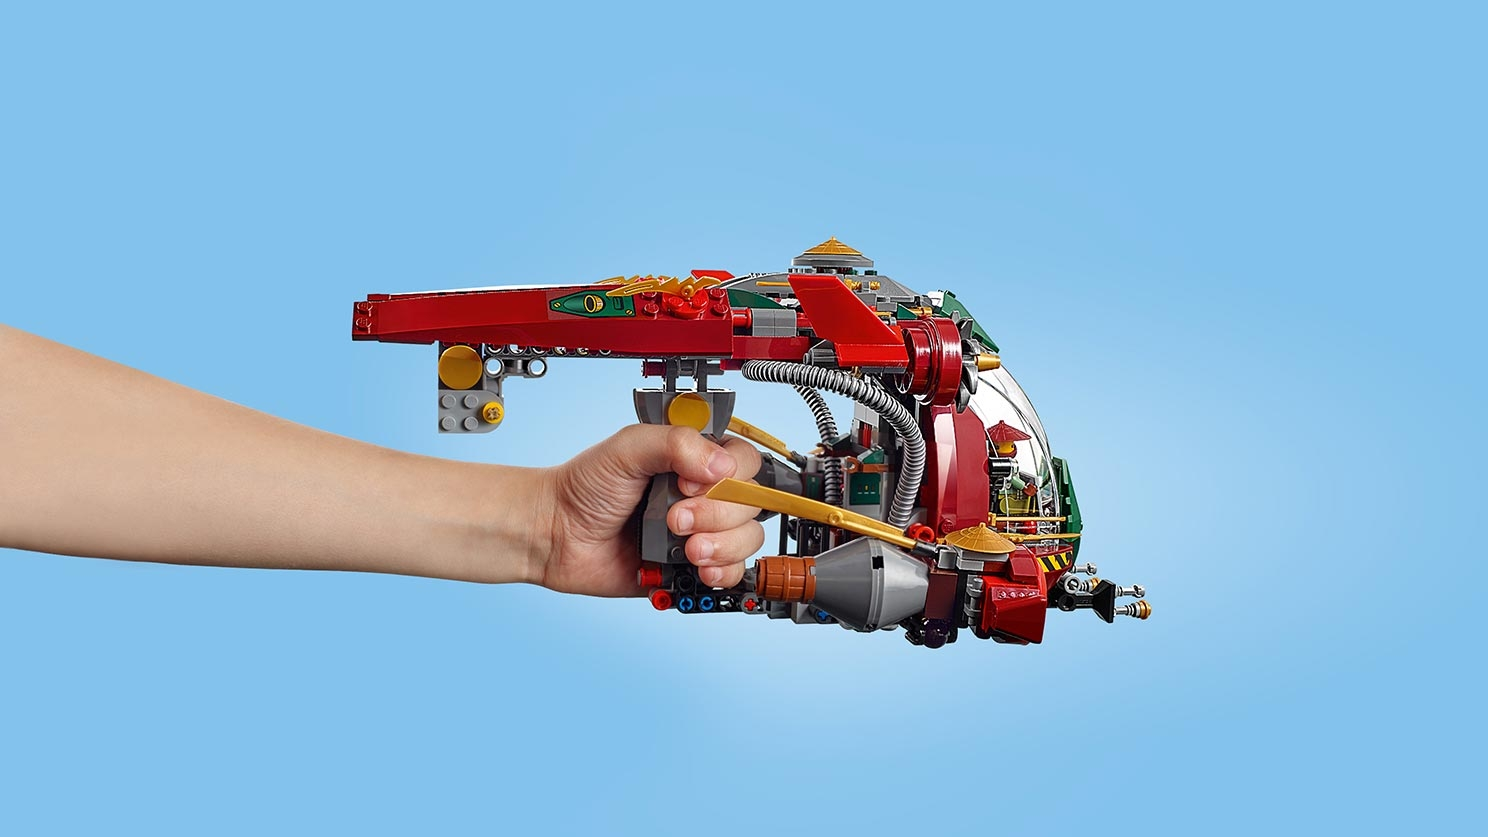 Ninjago Minifigure Lego Ronin 70735 Possession Ronin R.E.X